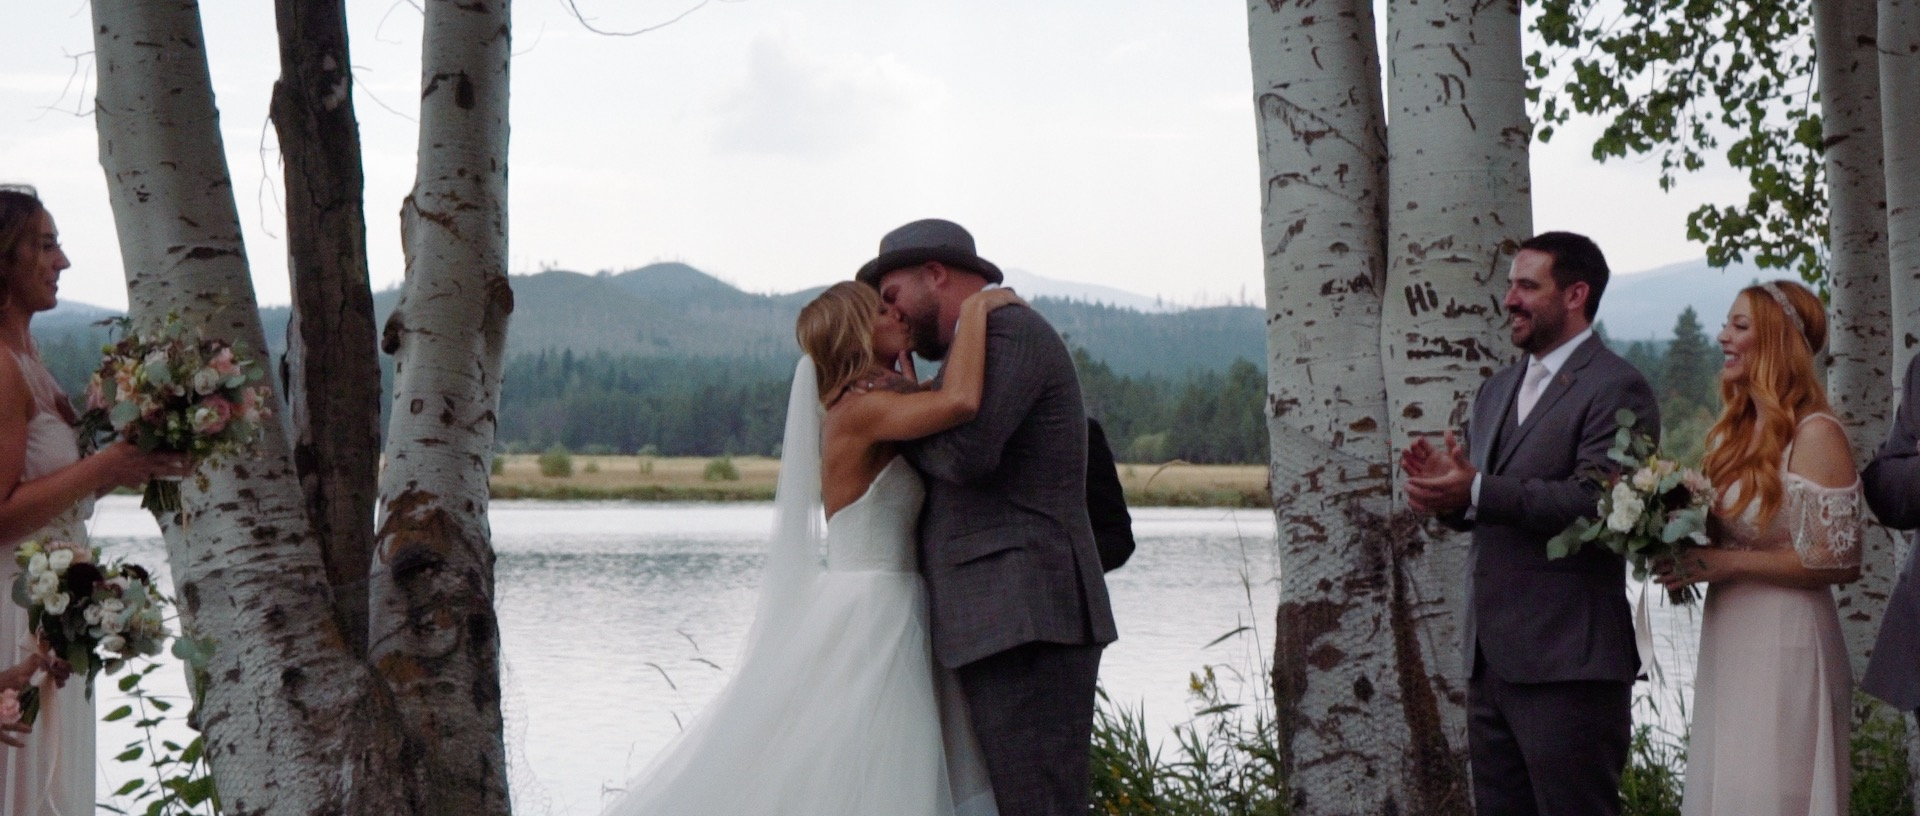 Black Butte Ranch Wedding 9.jpg